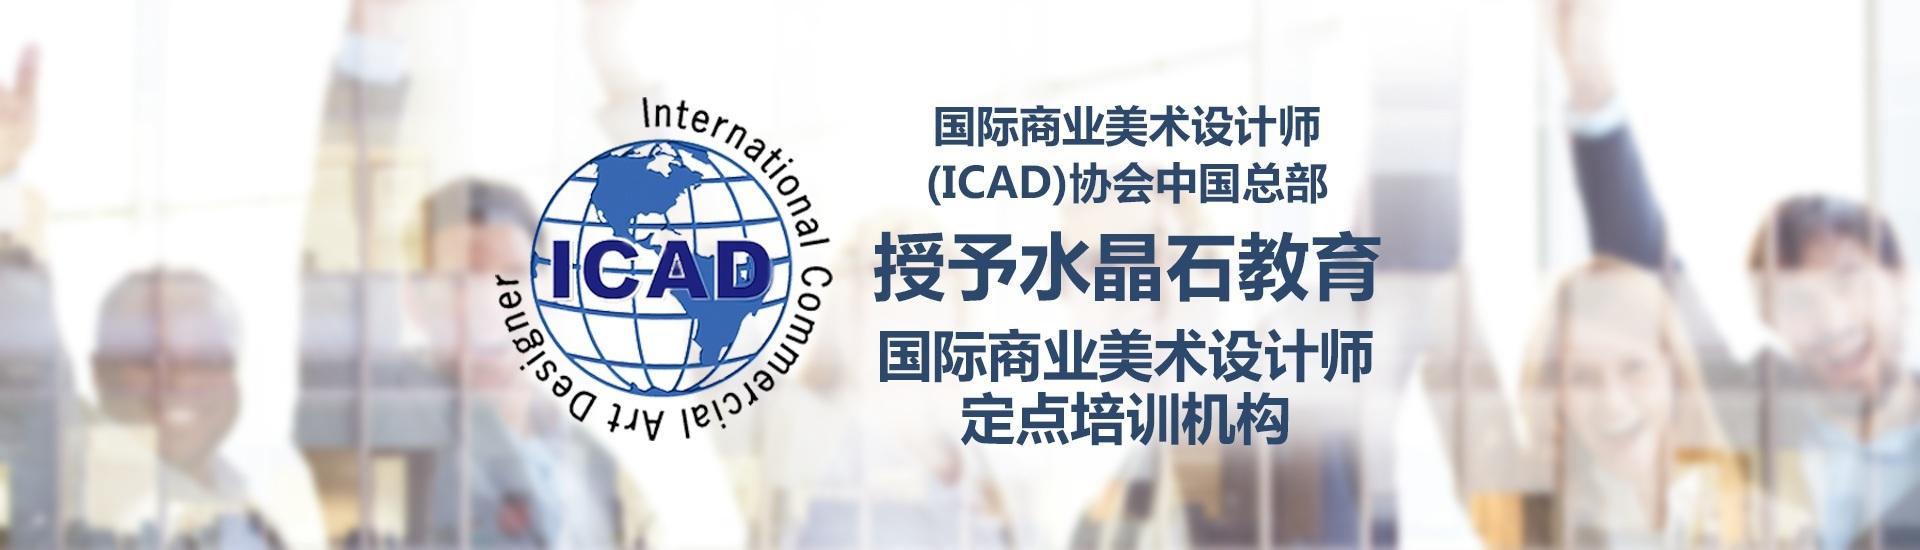 ICAD认证